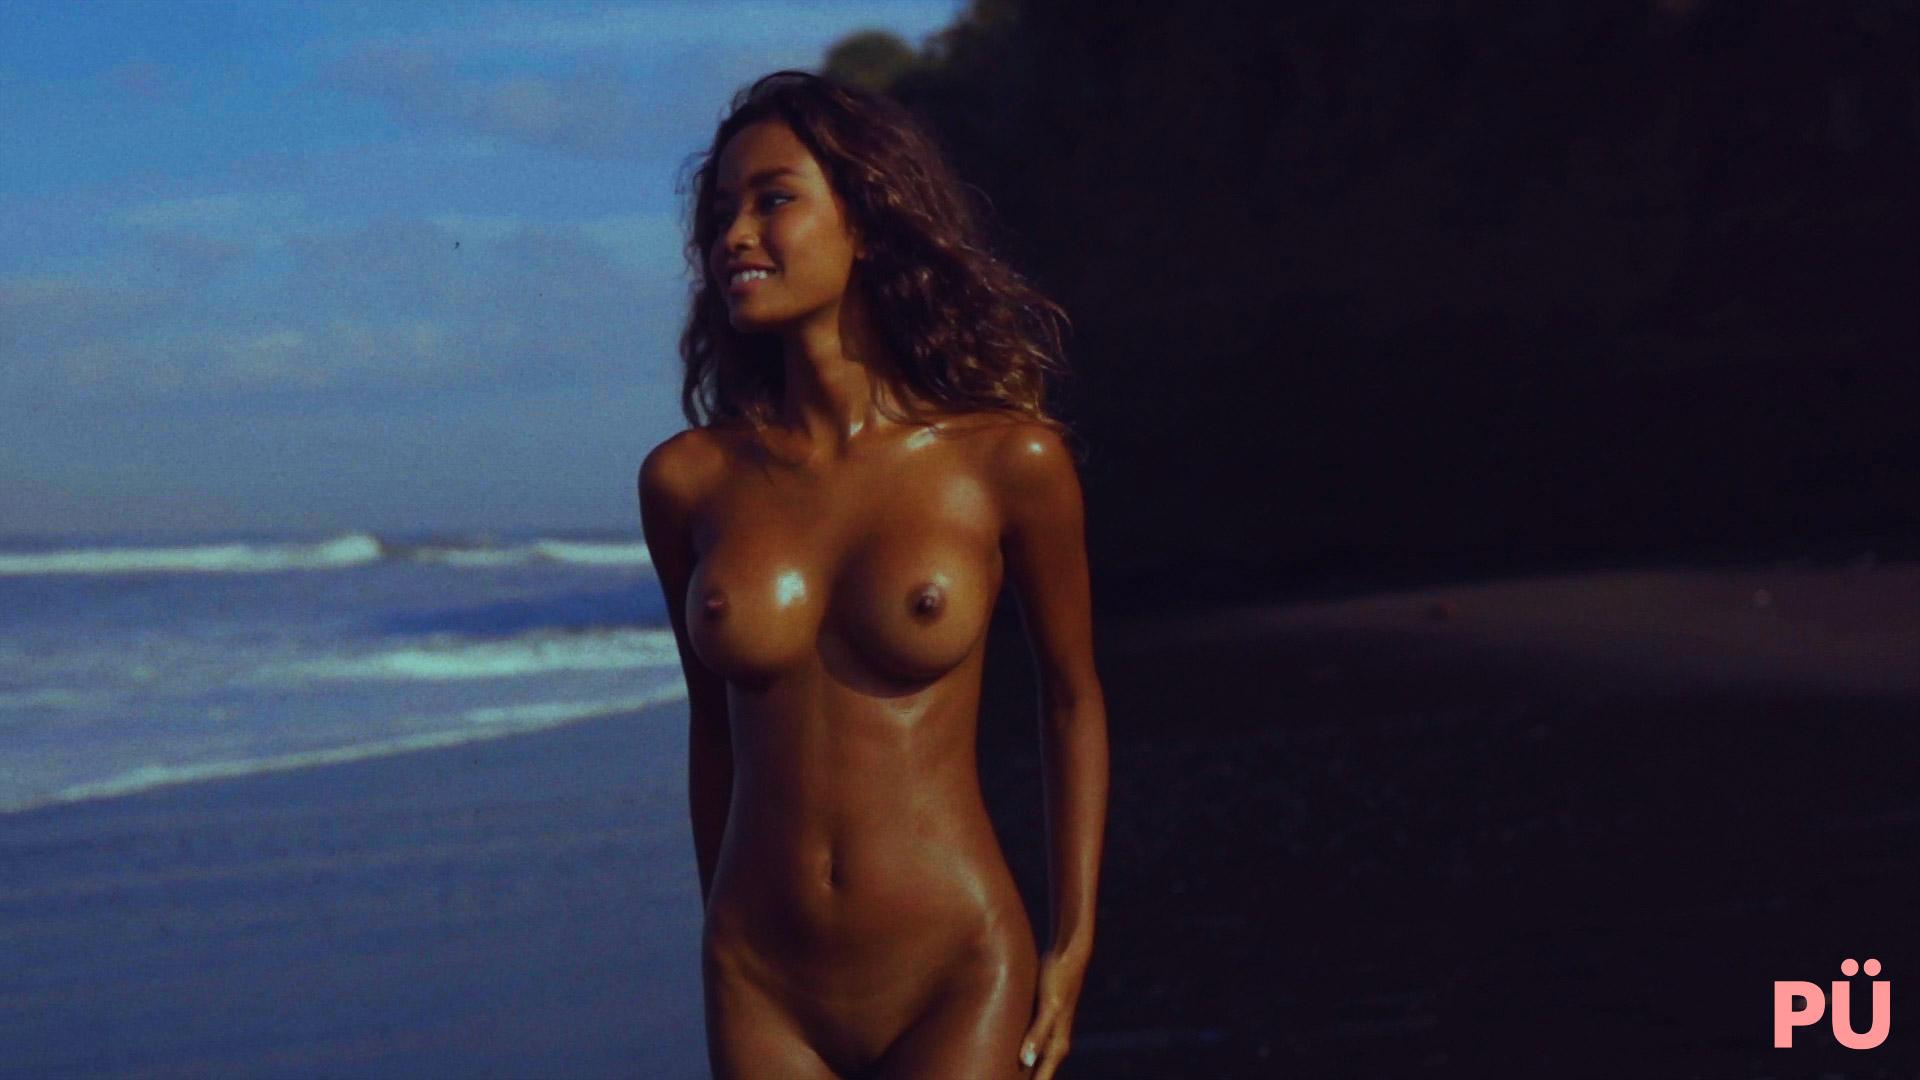 018-Black-Oilie-Sand.00_04_47_41.Still050.jpg